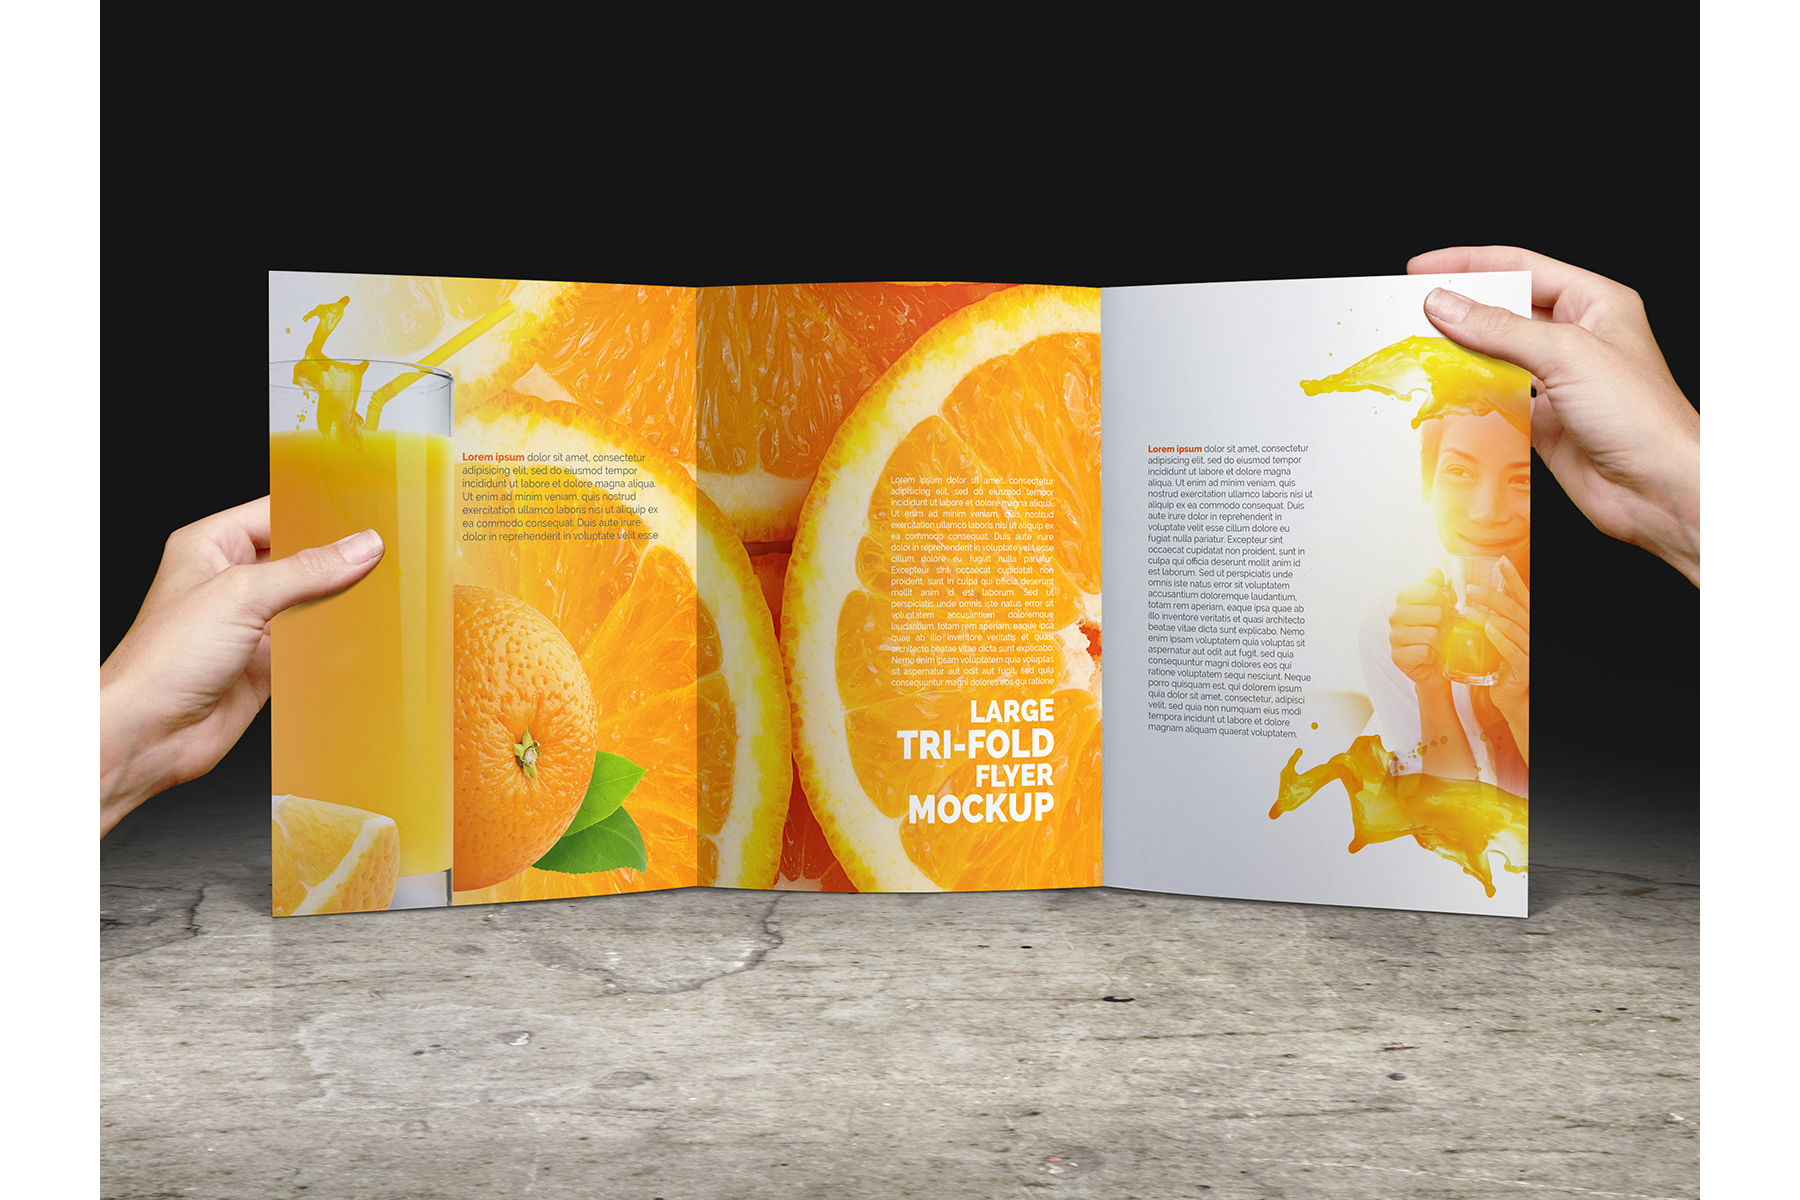 Large Trifold Brochure Mockup example image 11